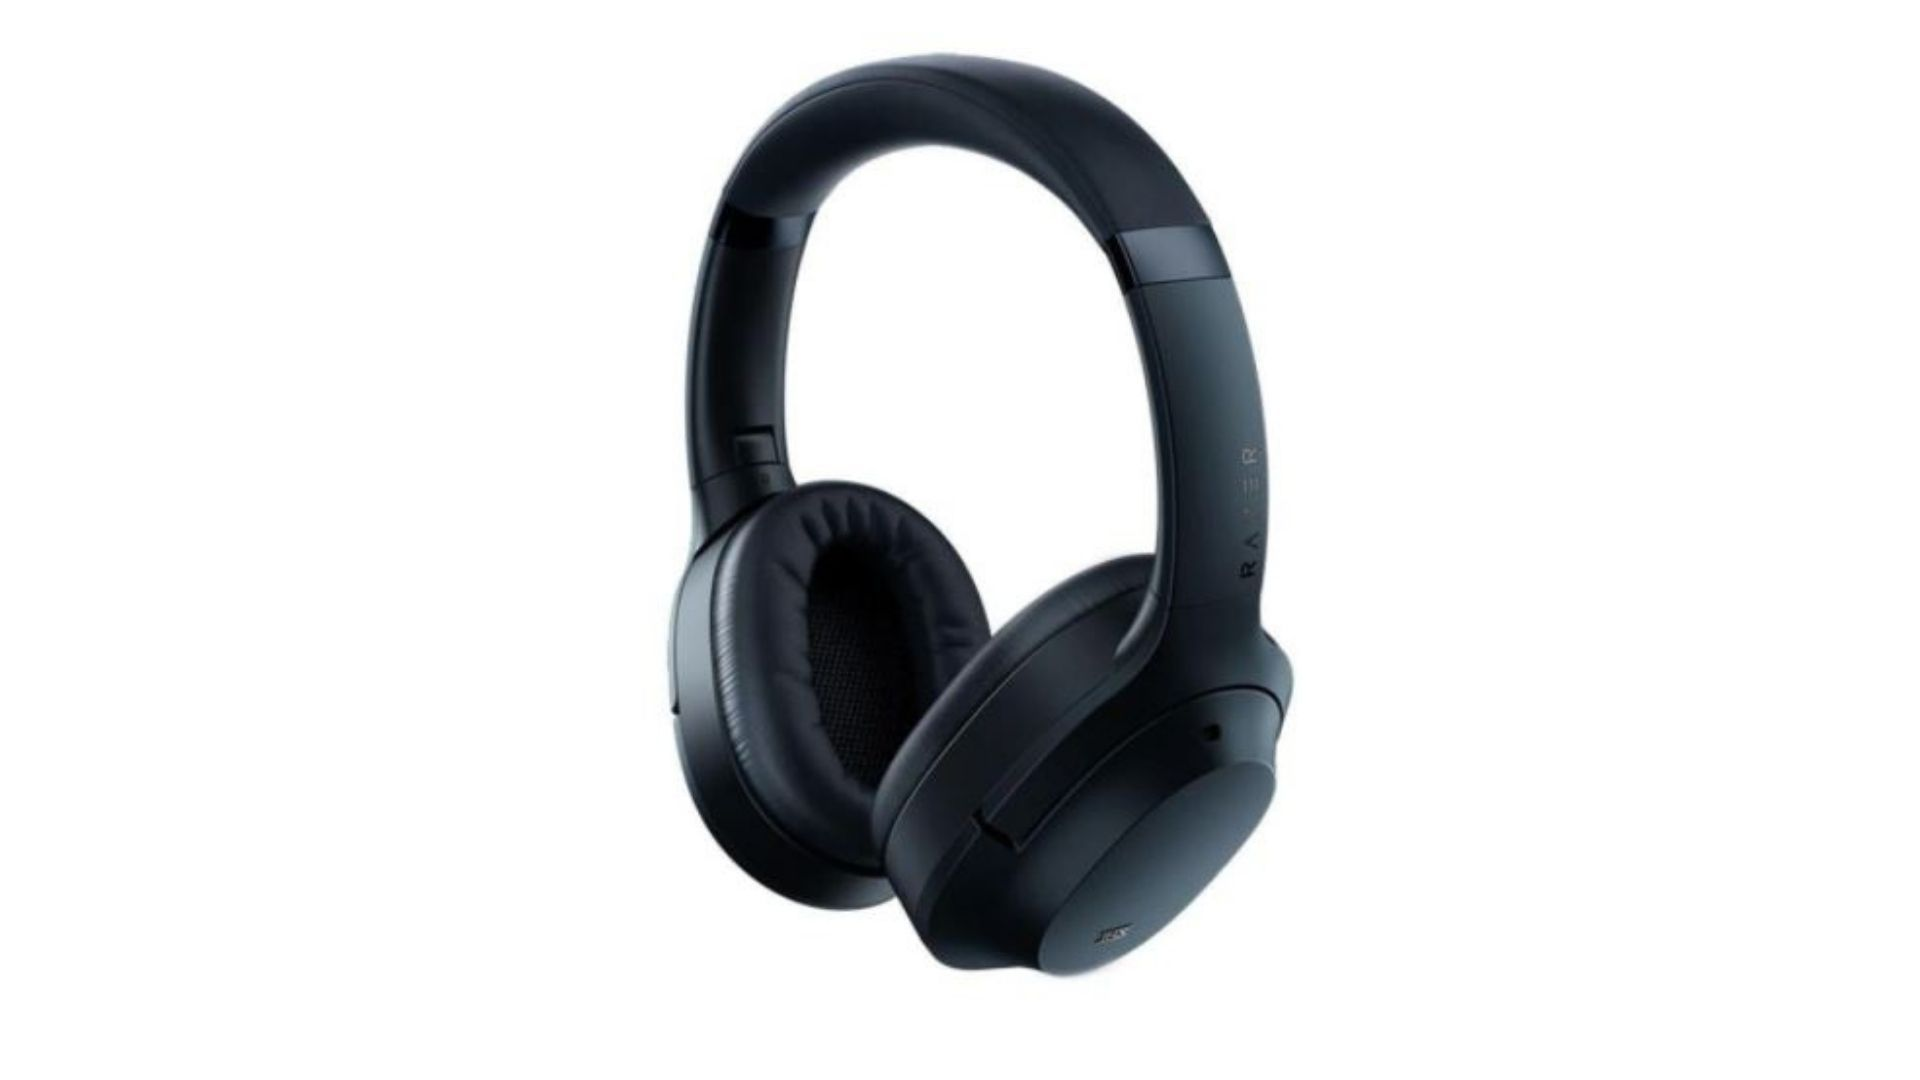 Headset Razer Opus Wireless preto no fundo branco